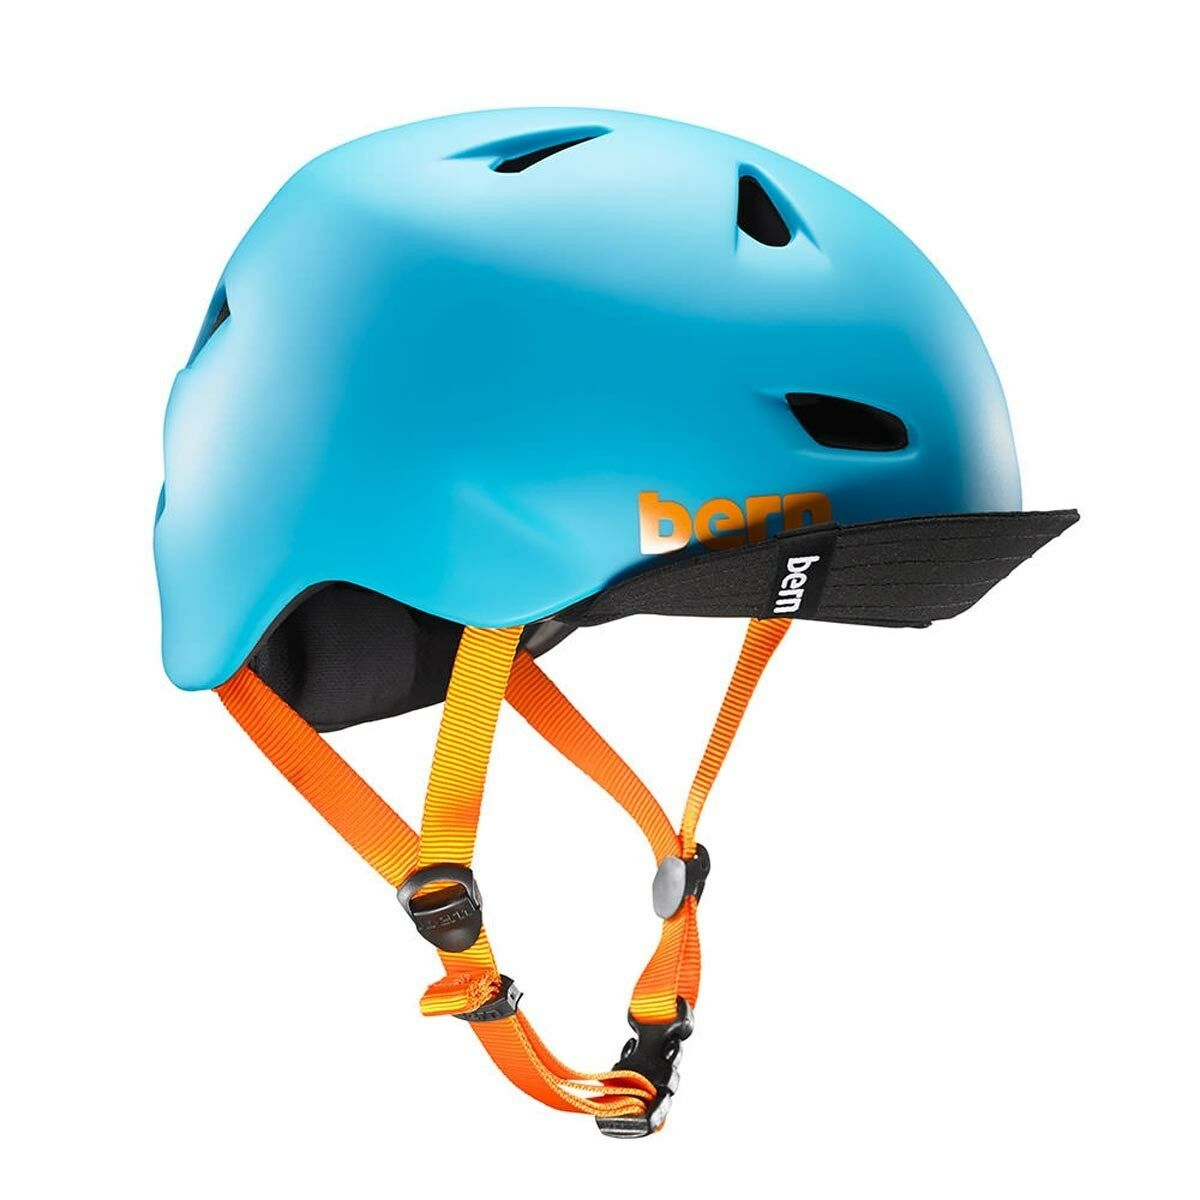 Bern Brentwood BICICLETTA skate CYCLE FLIP Visor Casco Blu S-M L-XL XXL-XXXL